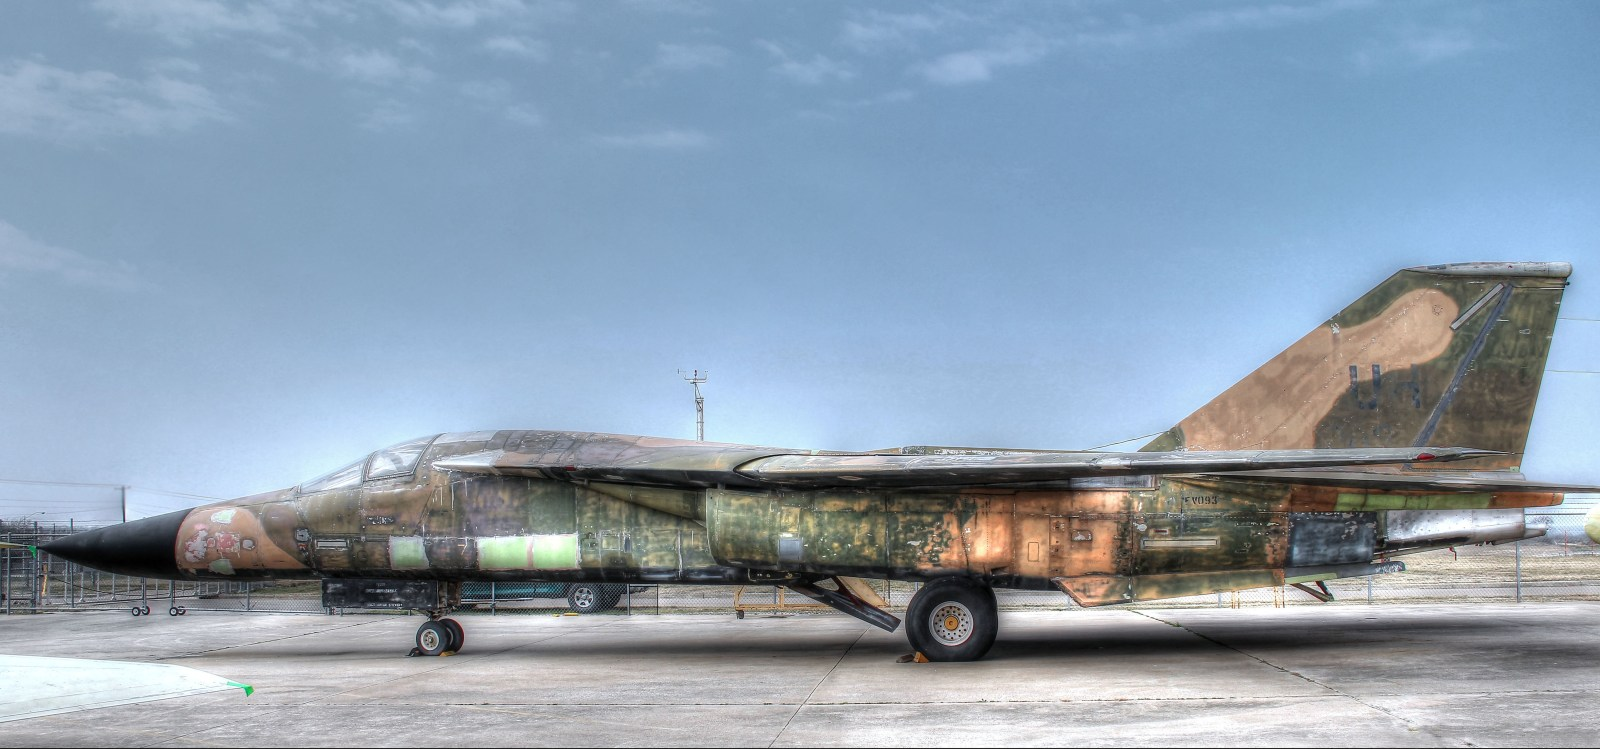 F-111 Aardvark profile